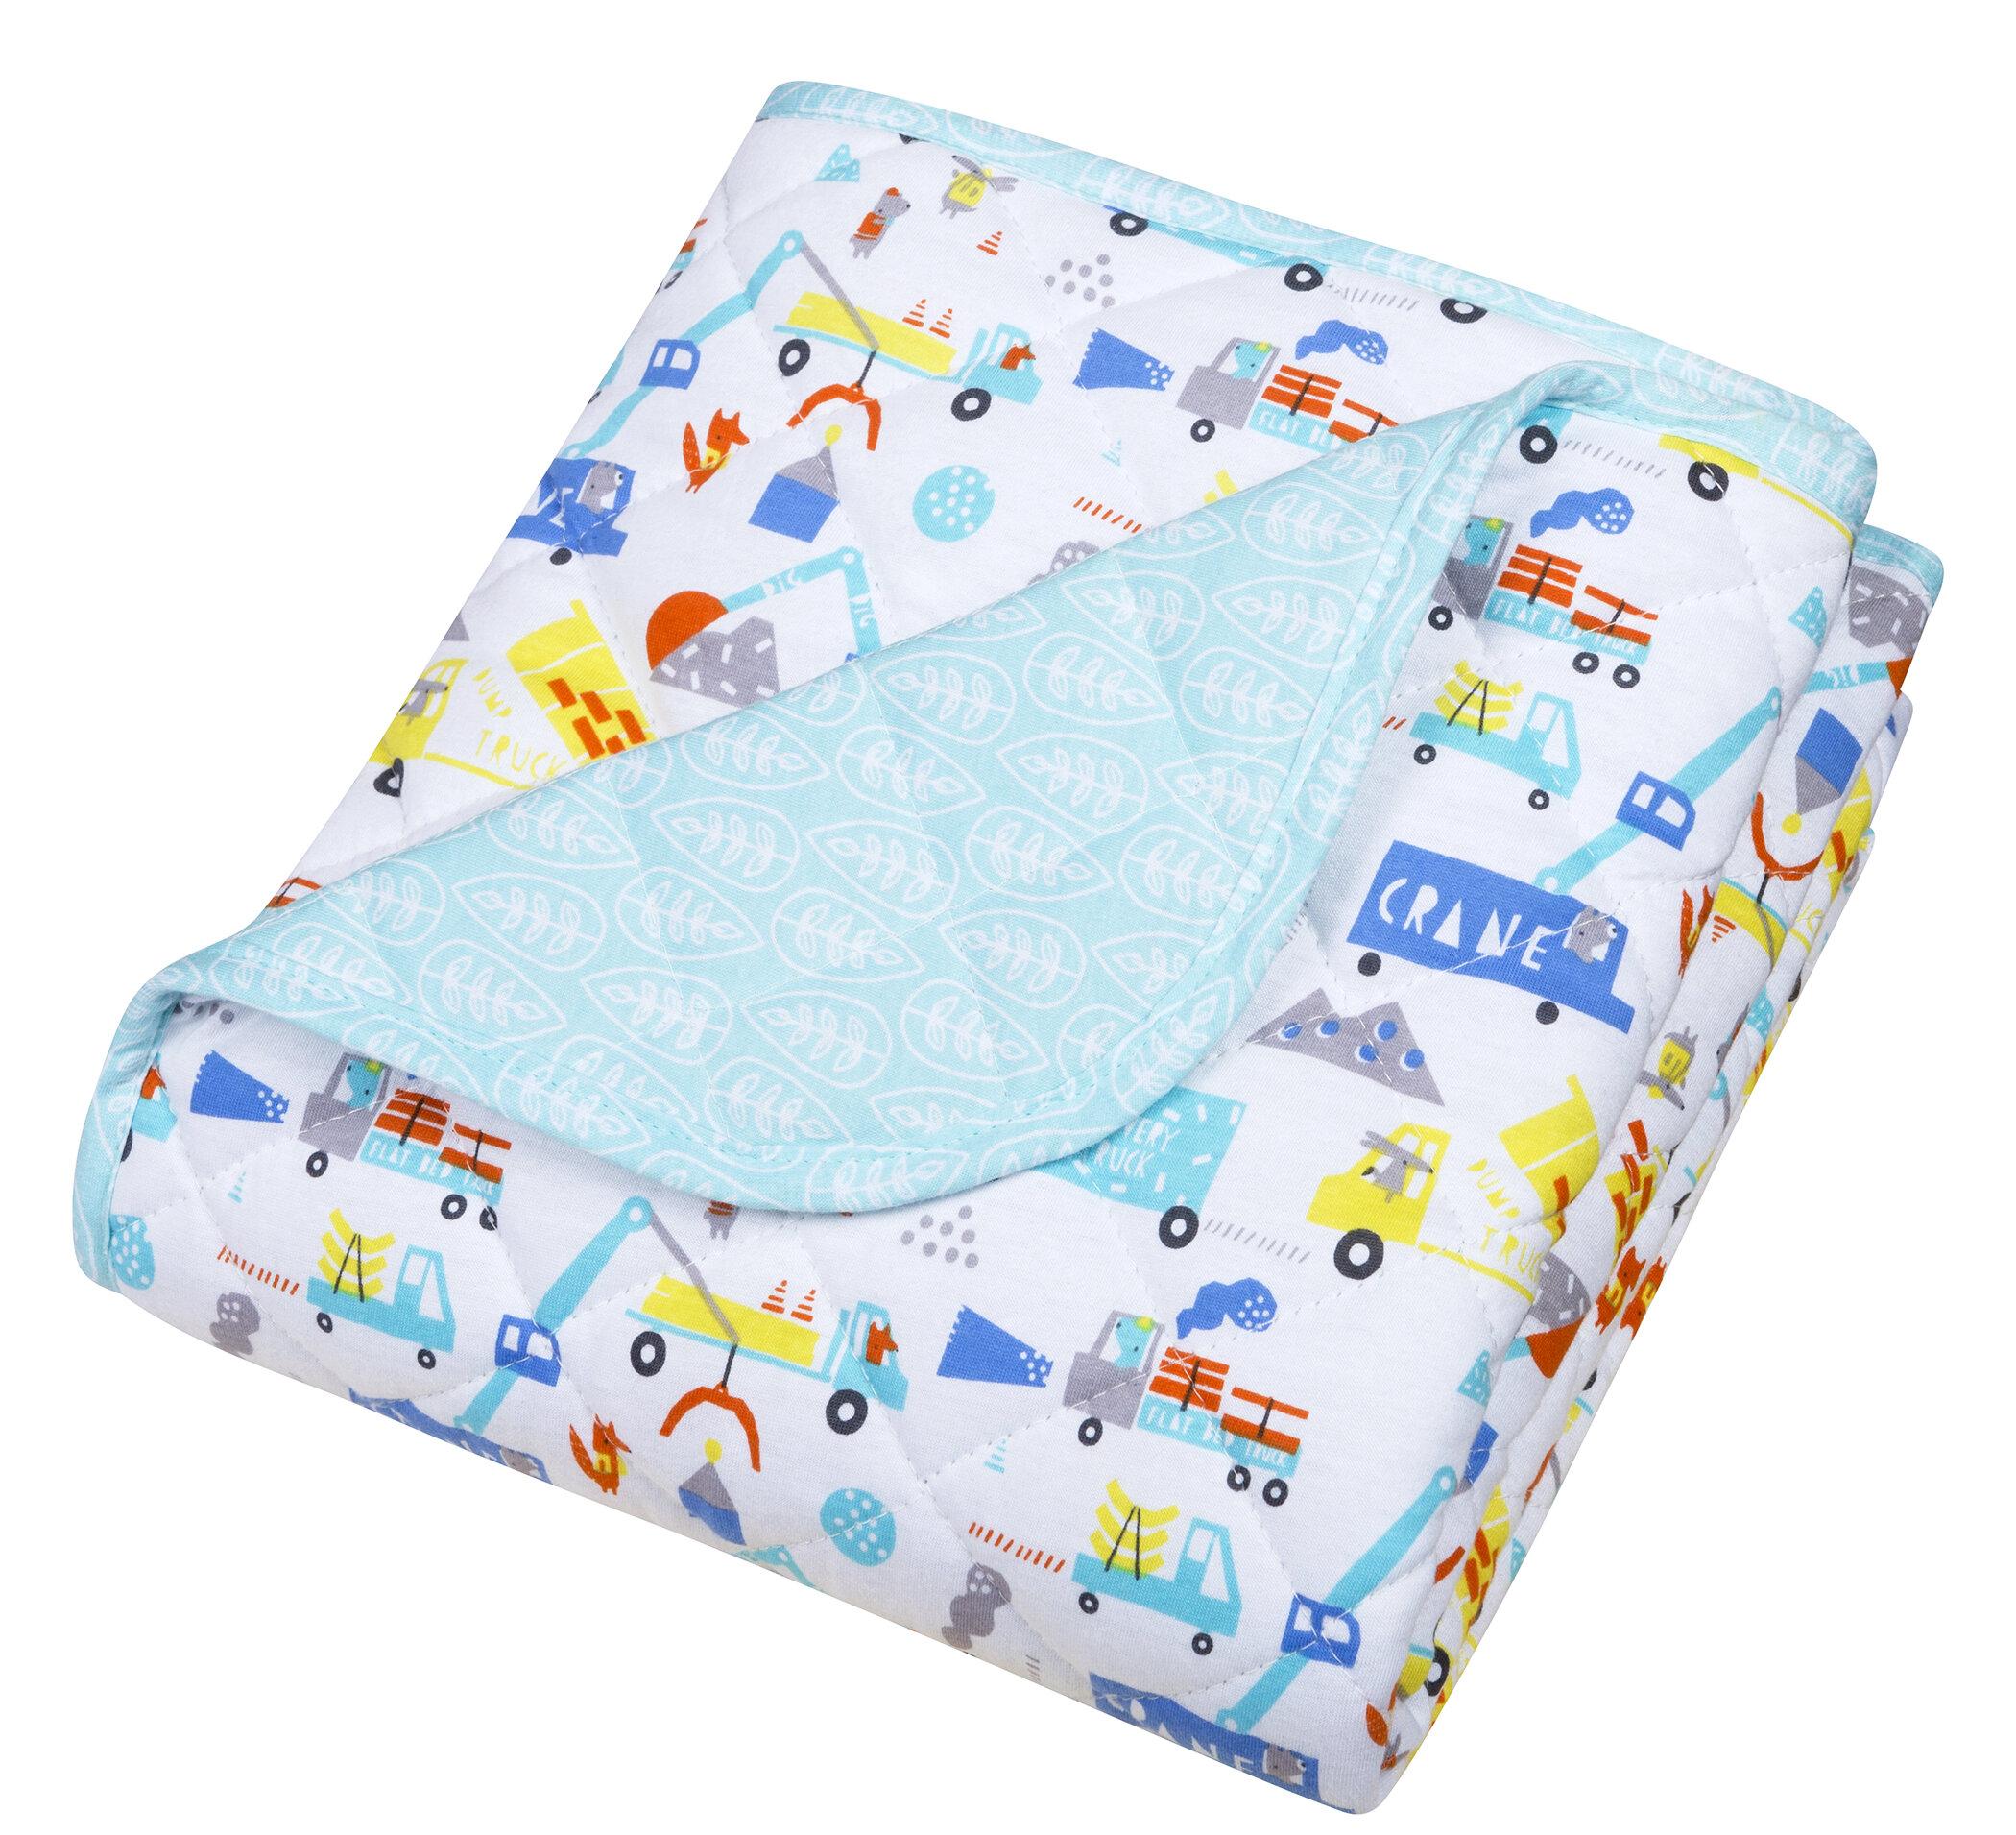 Boy Quilt Toddler Blanket Crib Quilt Baby Blanket Gender Neutral Snuggle Quilt Mod Diamonds Quilt Baby Quilt Security Blanket